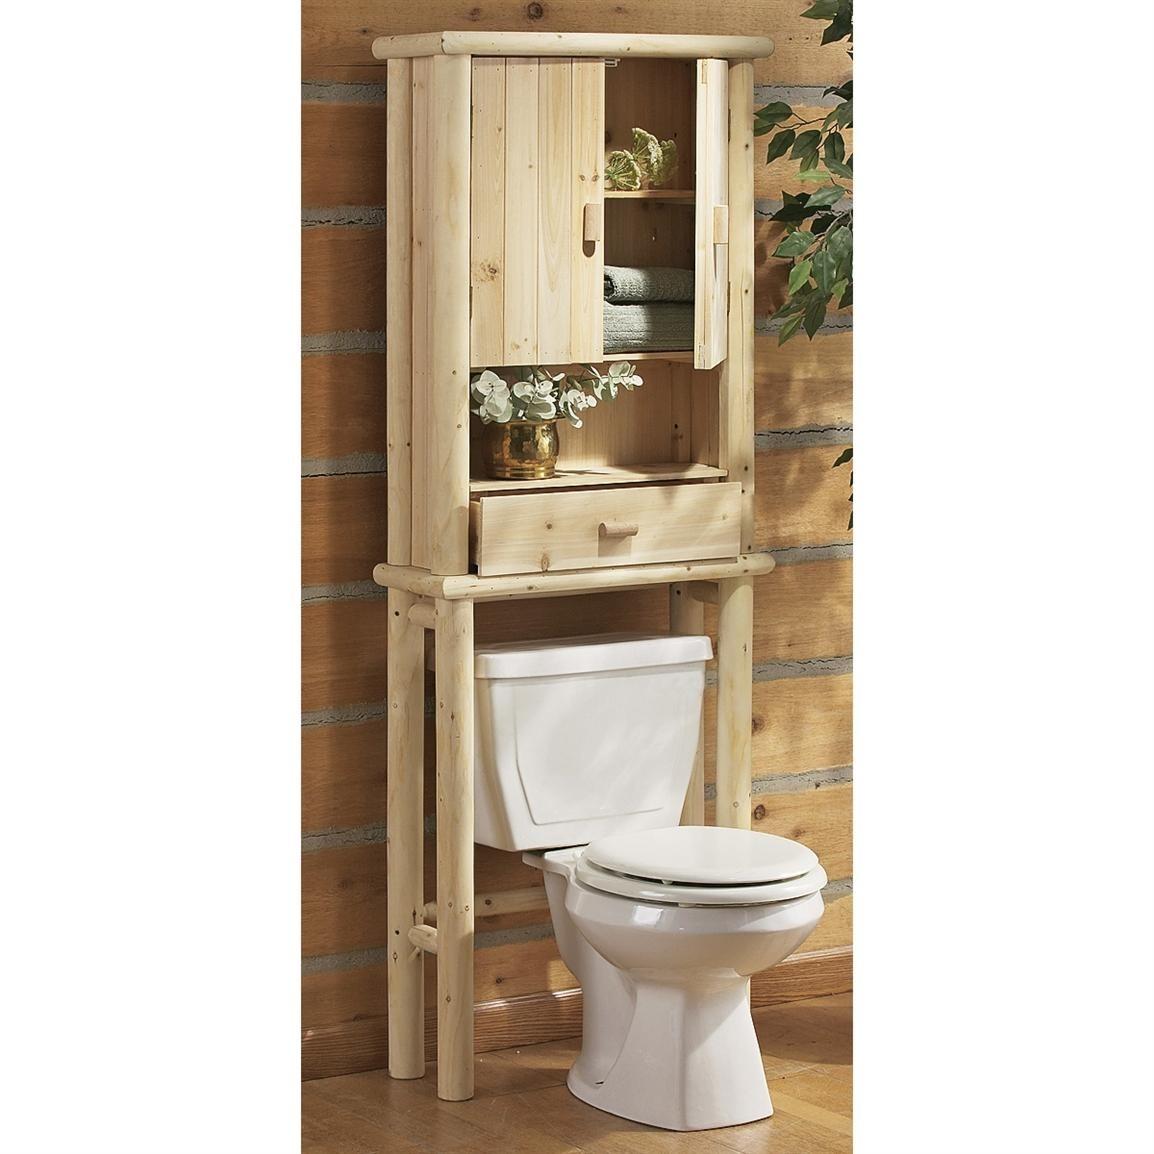 Merveilleux Storage Over Toilet 2